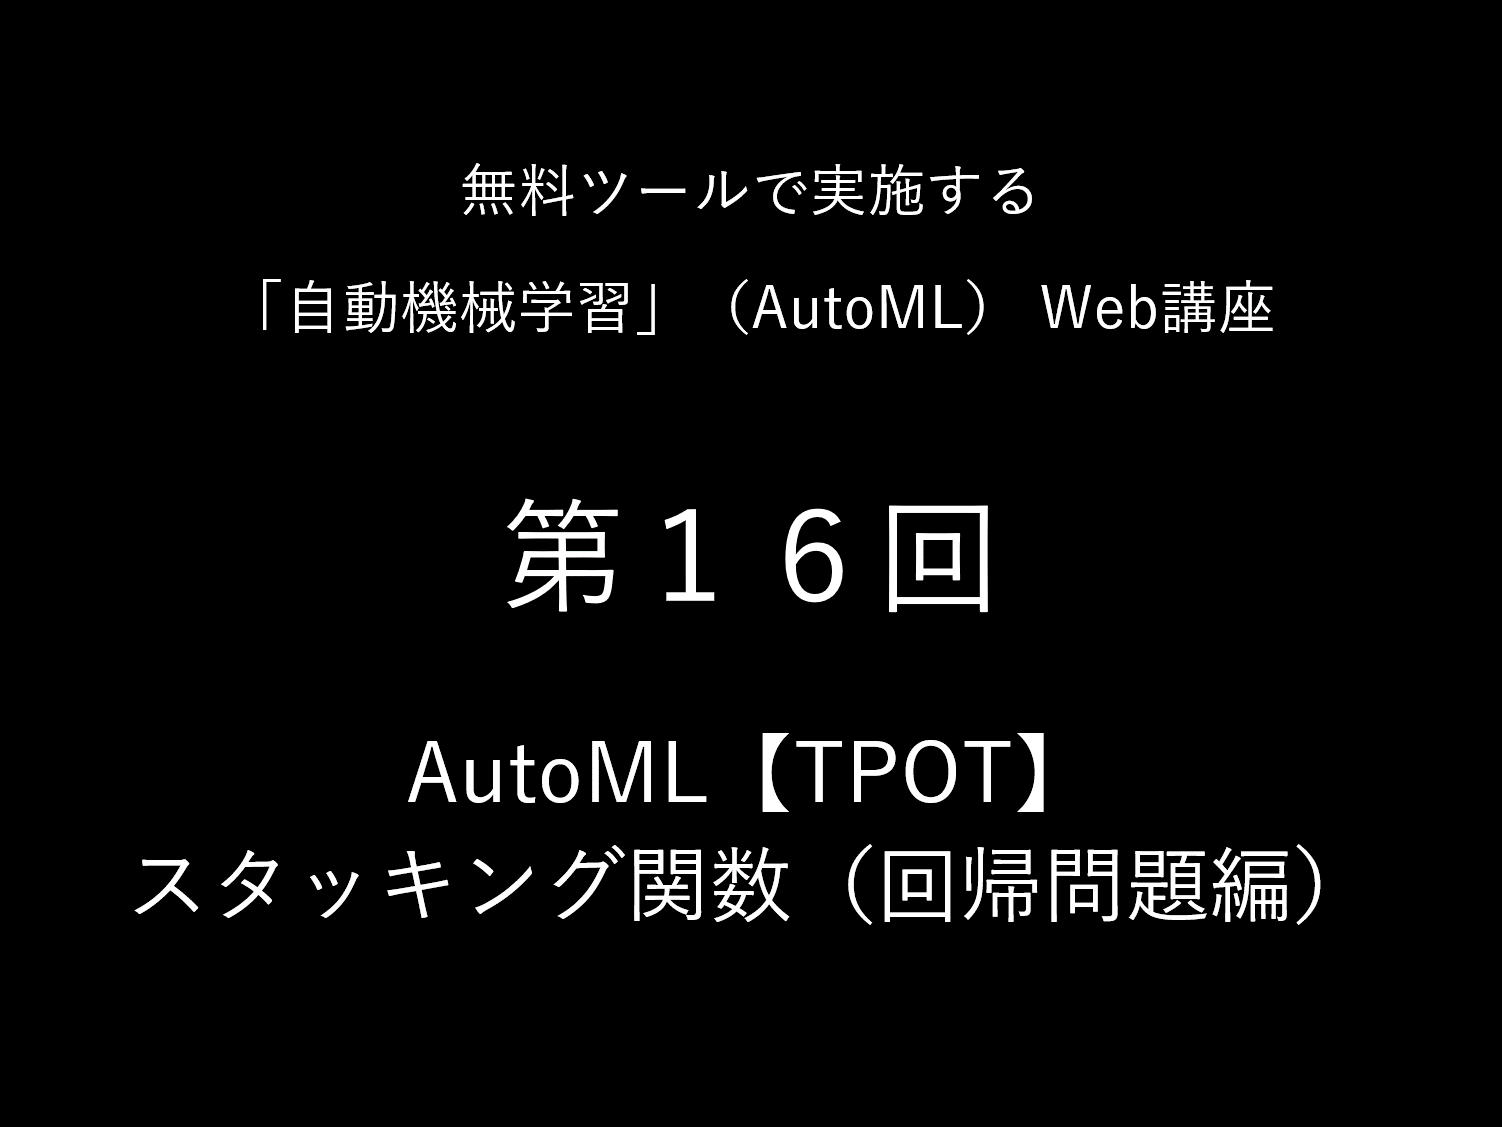 AutoML【TPOT】スタッキング関数「StackingEstimator」(回帰問題編)